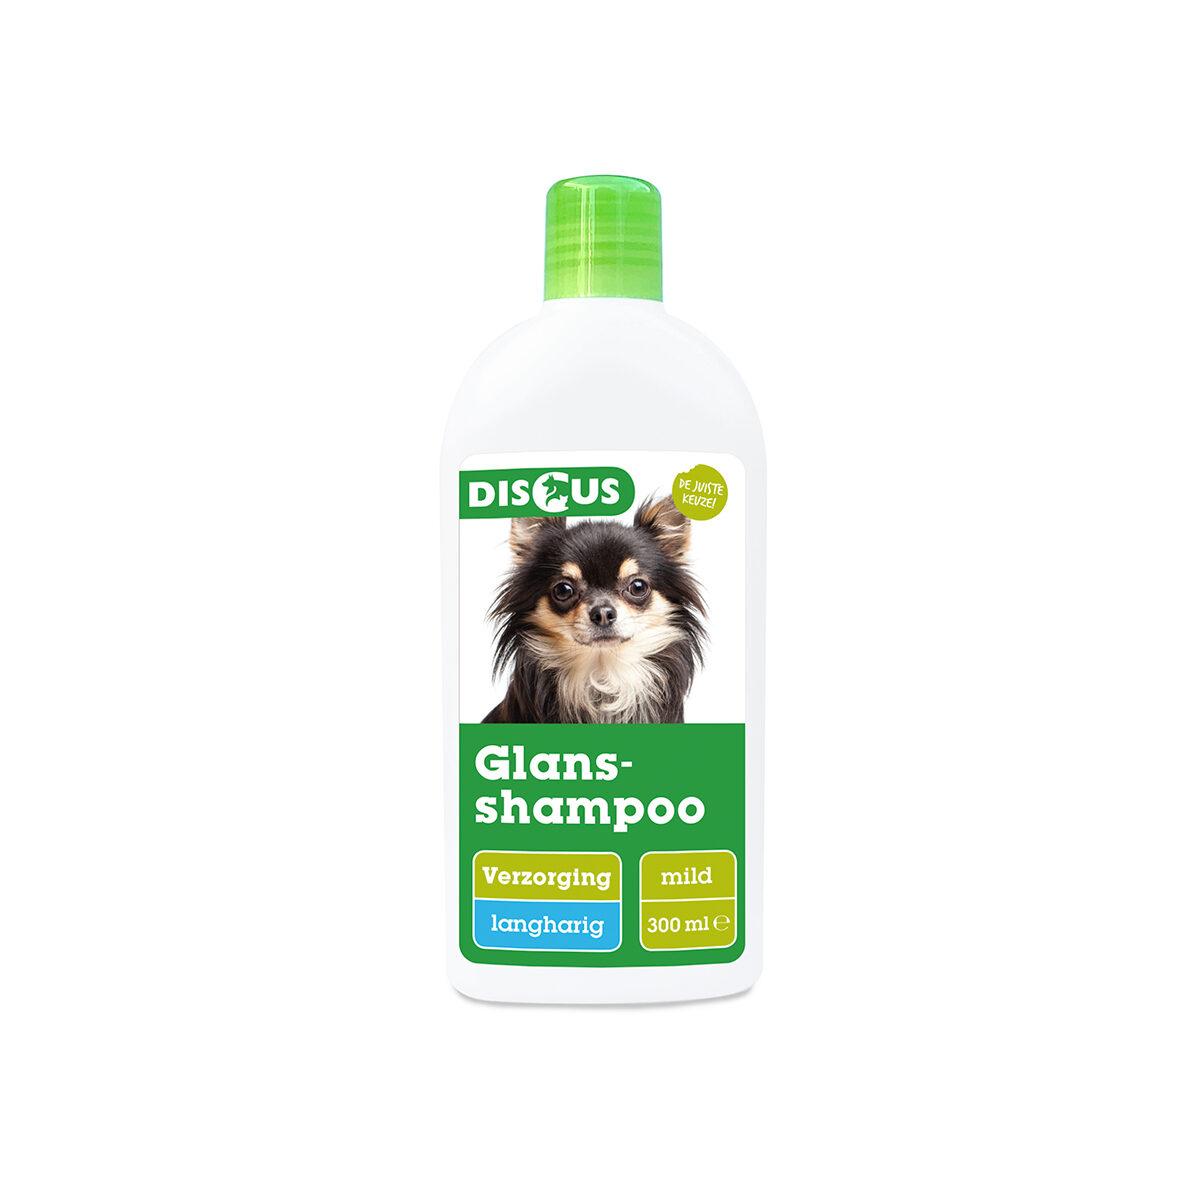 Discus Glans Shampoo 300 ml